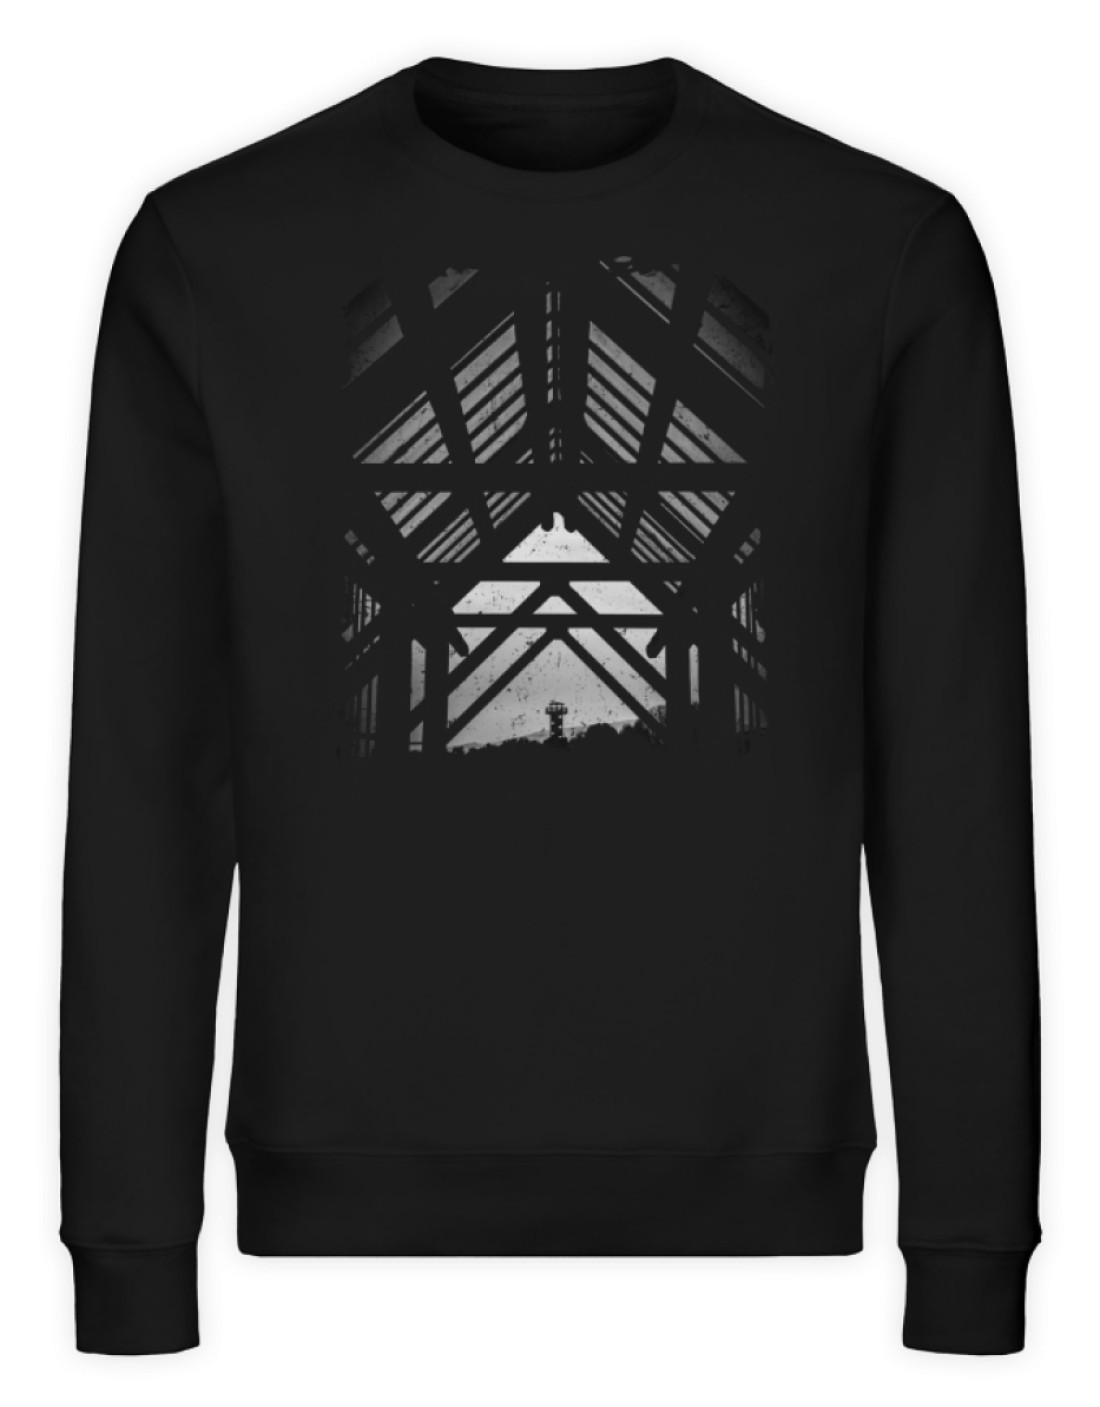 Seepark View (Unisex Premium Organic Sweatshirt ST/ST)